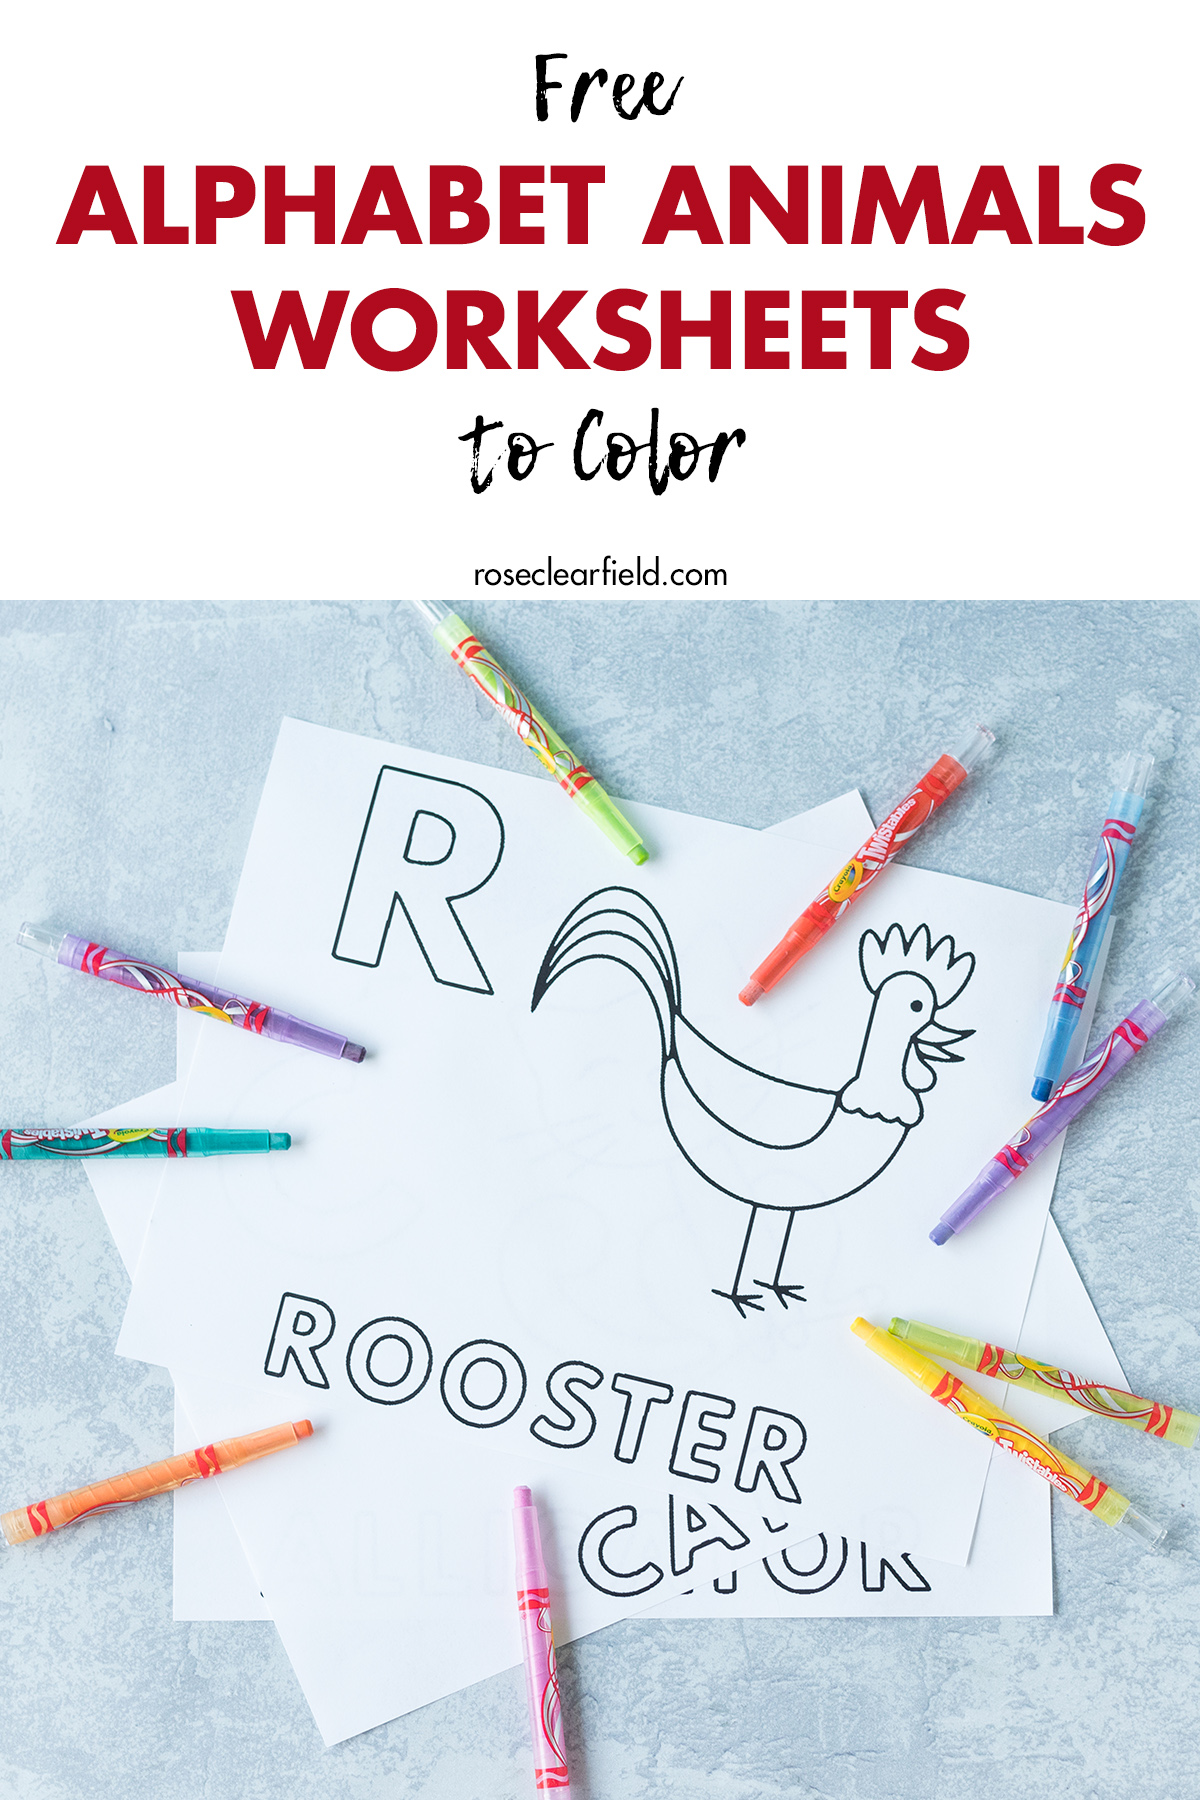 Free Alphabet Letter Animals Worksheets To Color Rose